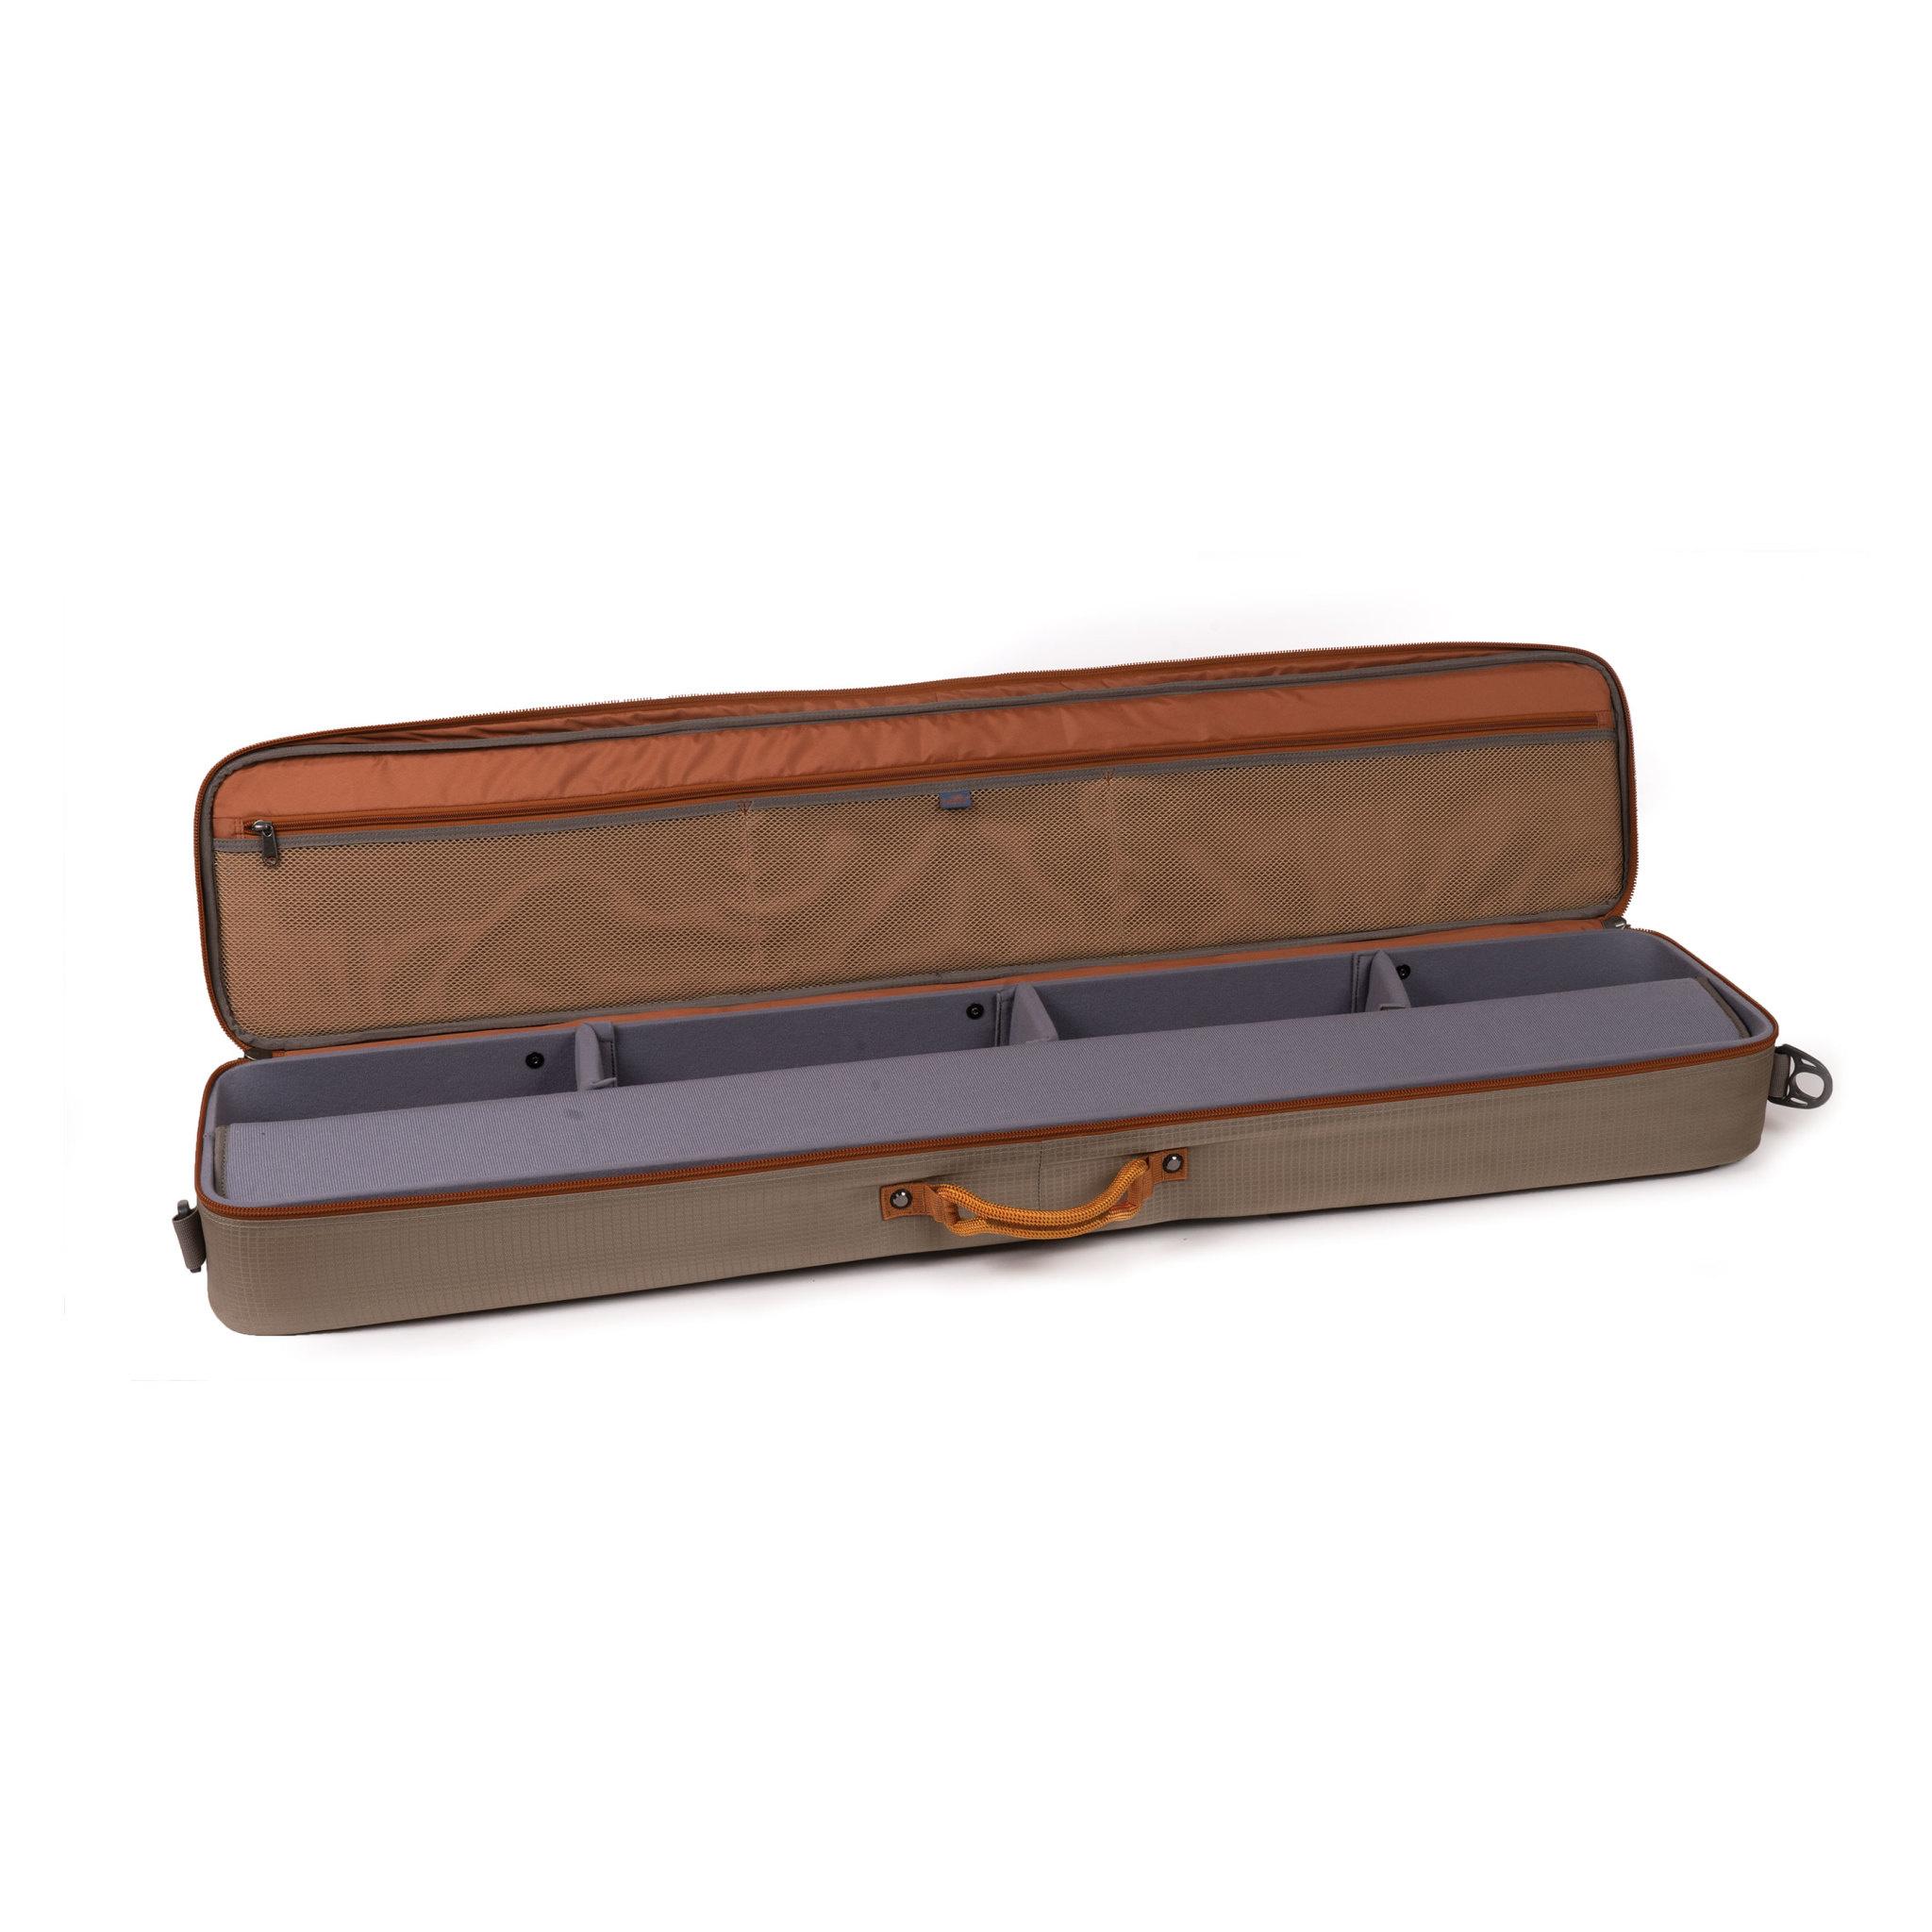 "Fishpond Fishpond Dakota Rod & Reel Case - 45"""